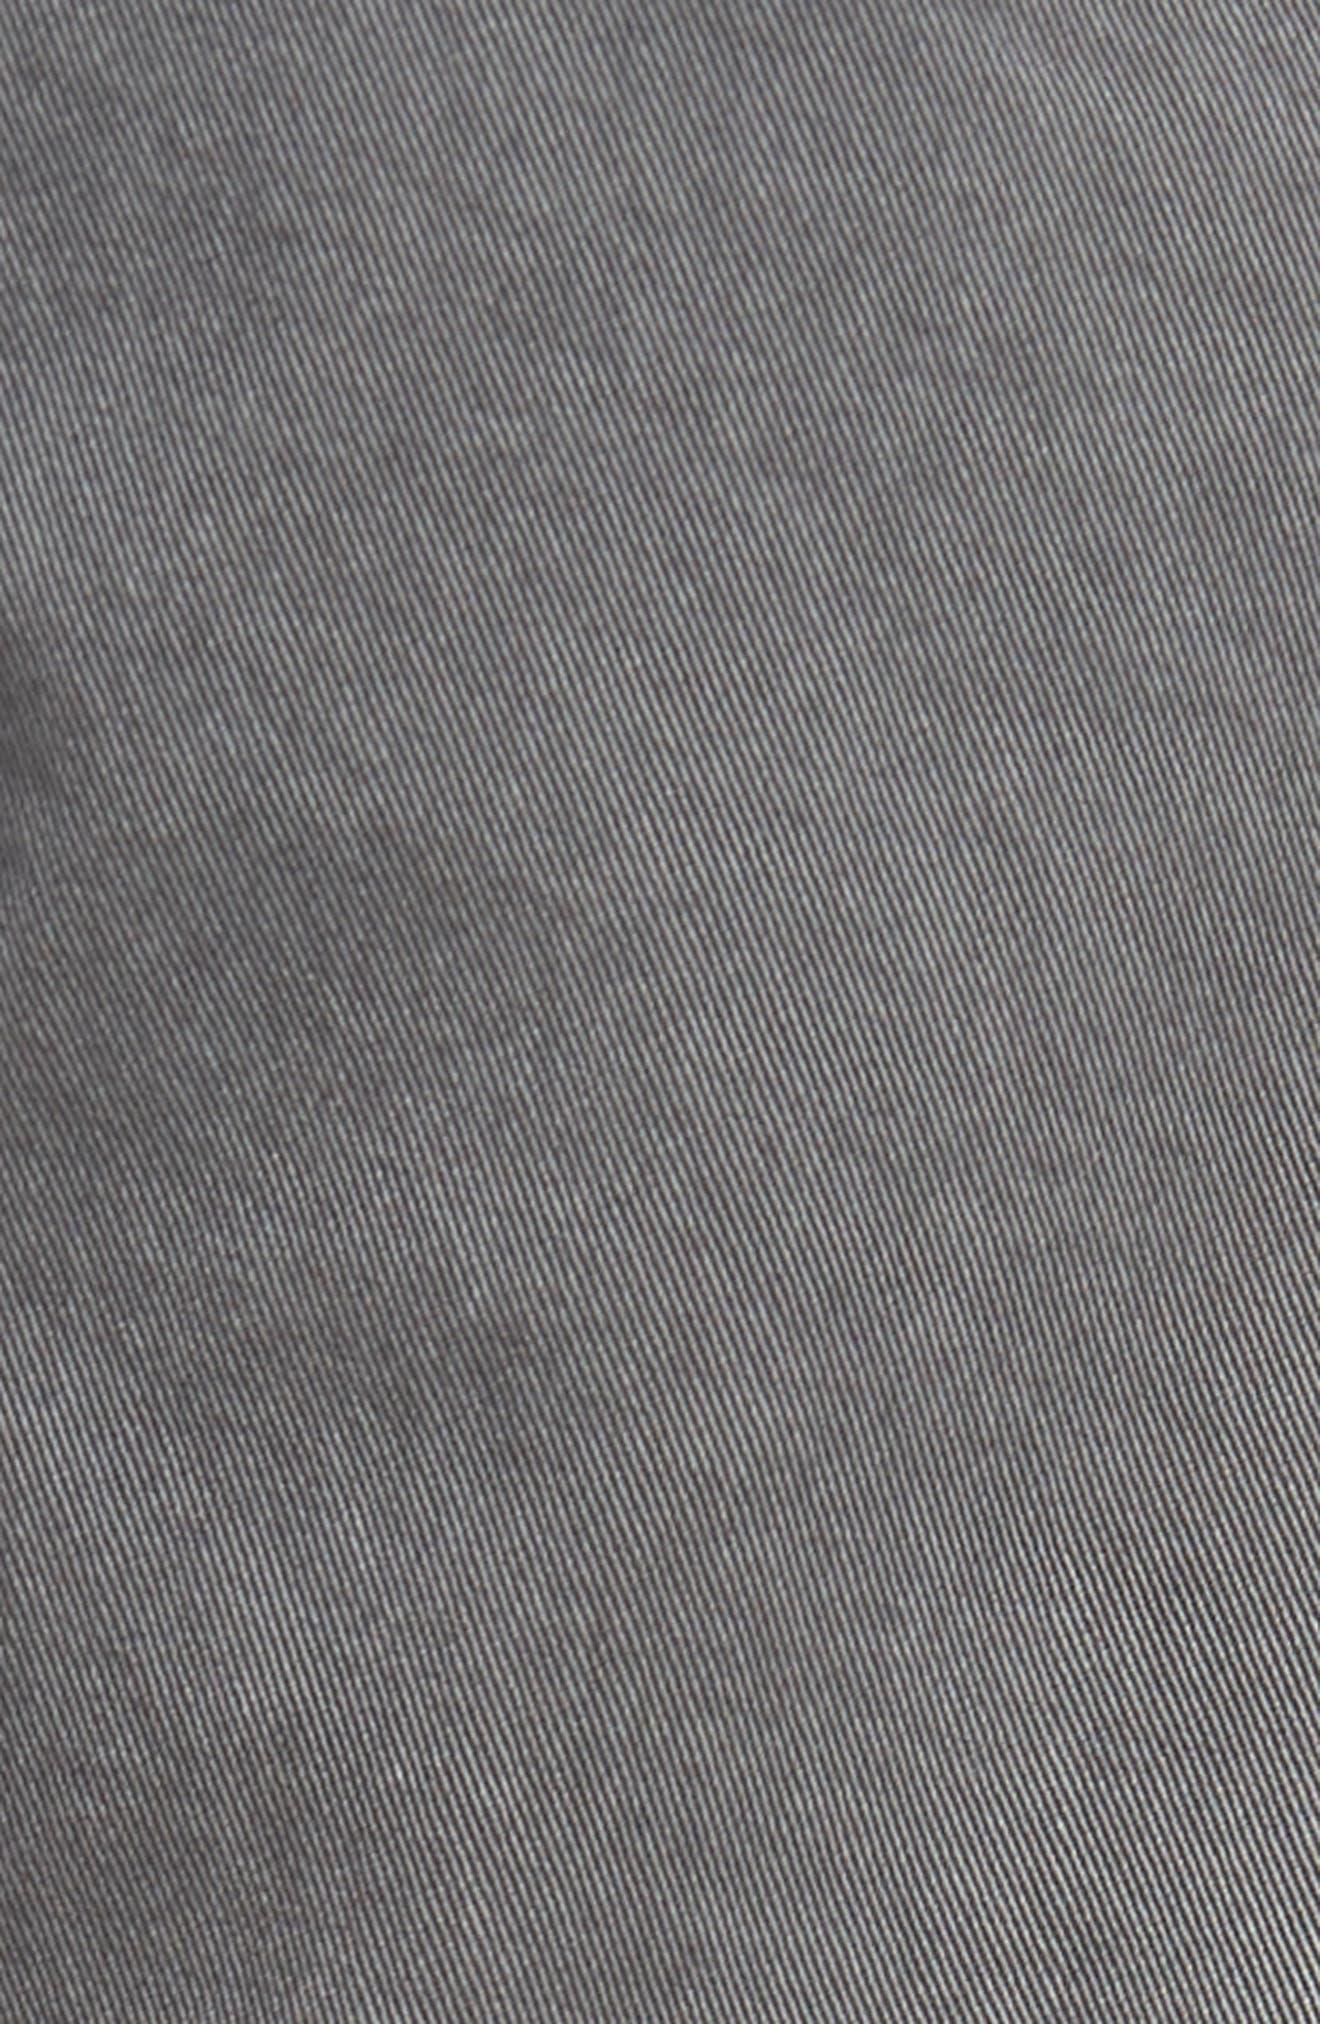 Lennox Slim Fit Five-Pocket Pants,                             Alternate thumbnail 5, color,                             VINTAGE THUNDER GREY